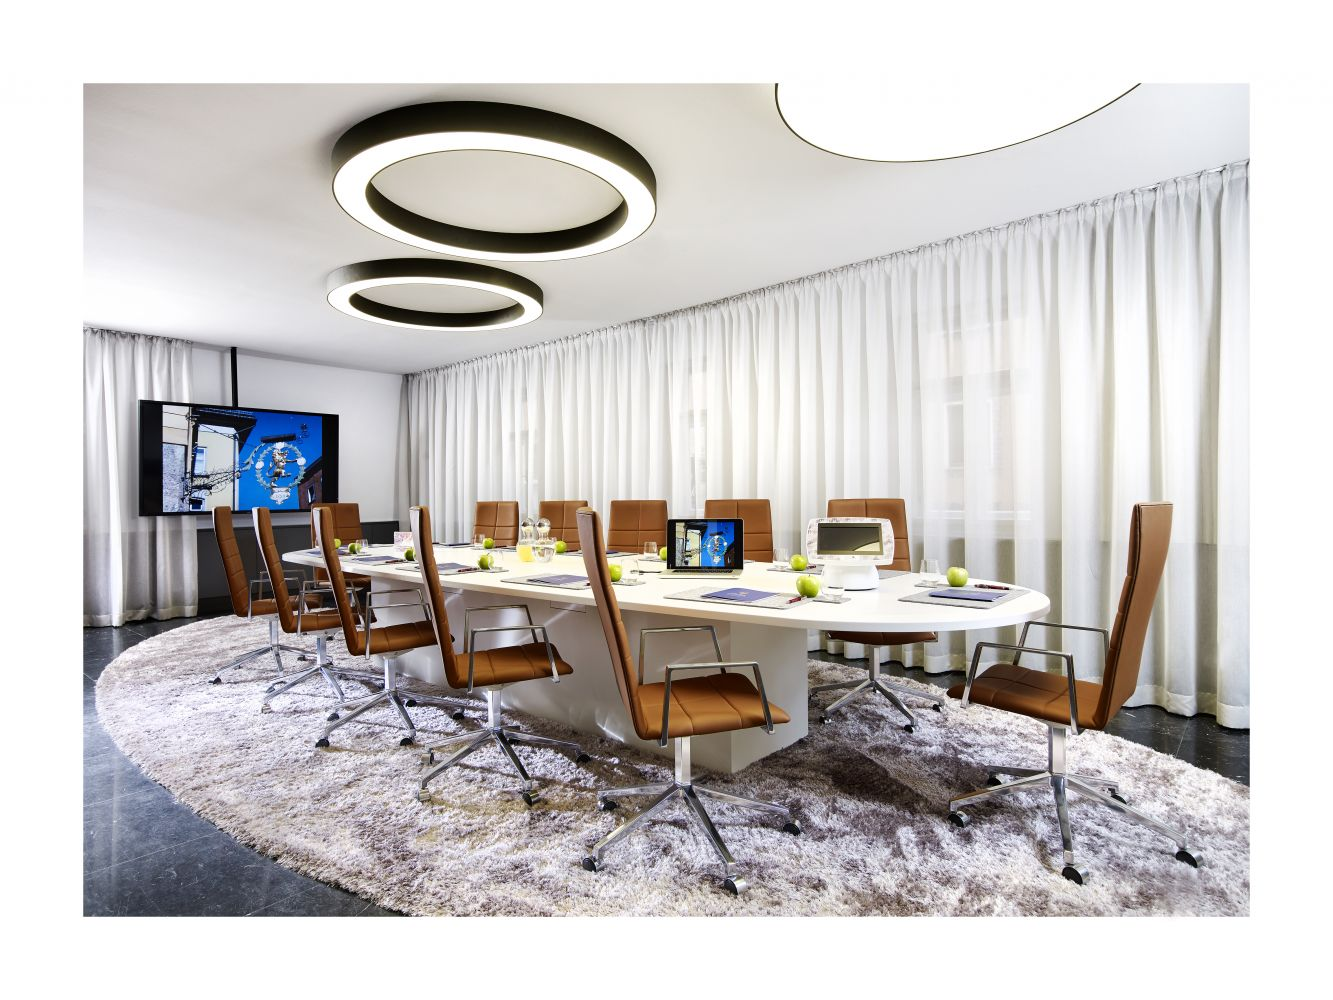 Hotel innsbruck lammhults for Design hotel innsbruck